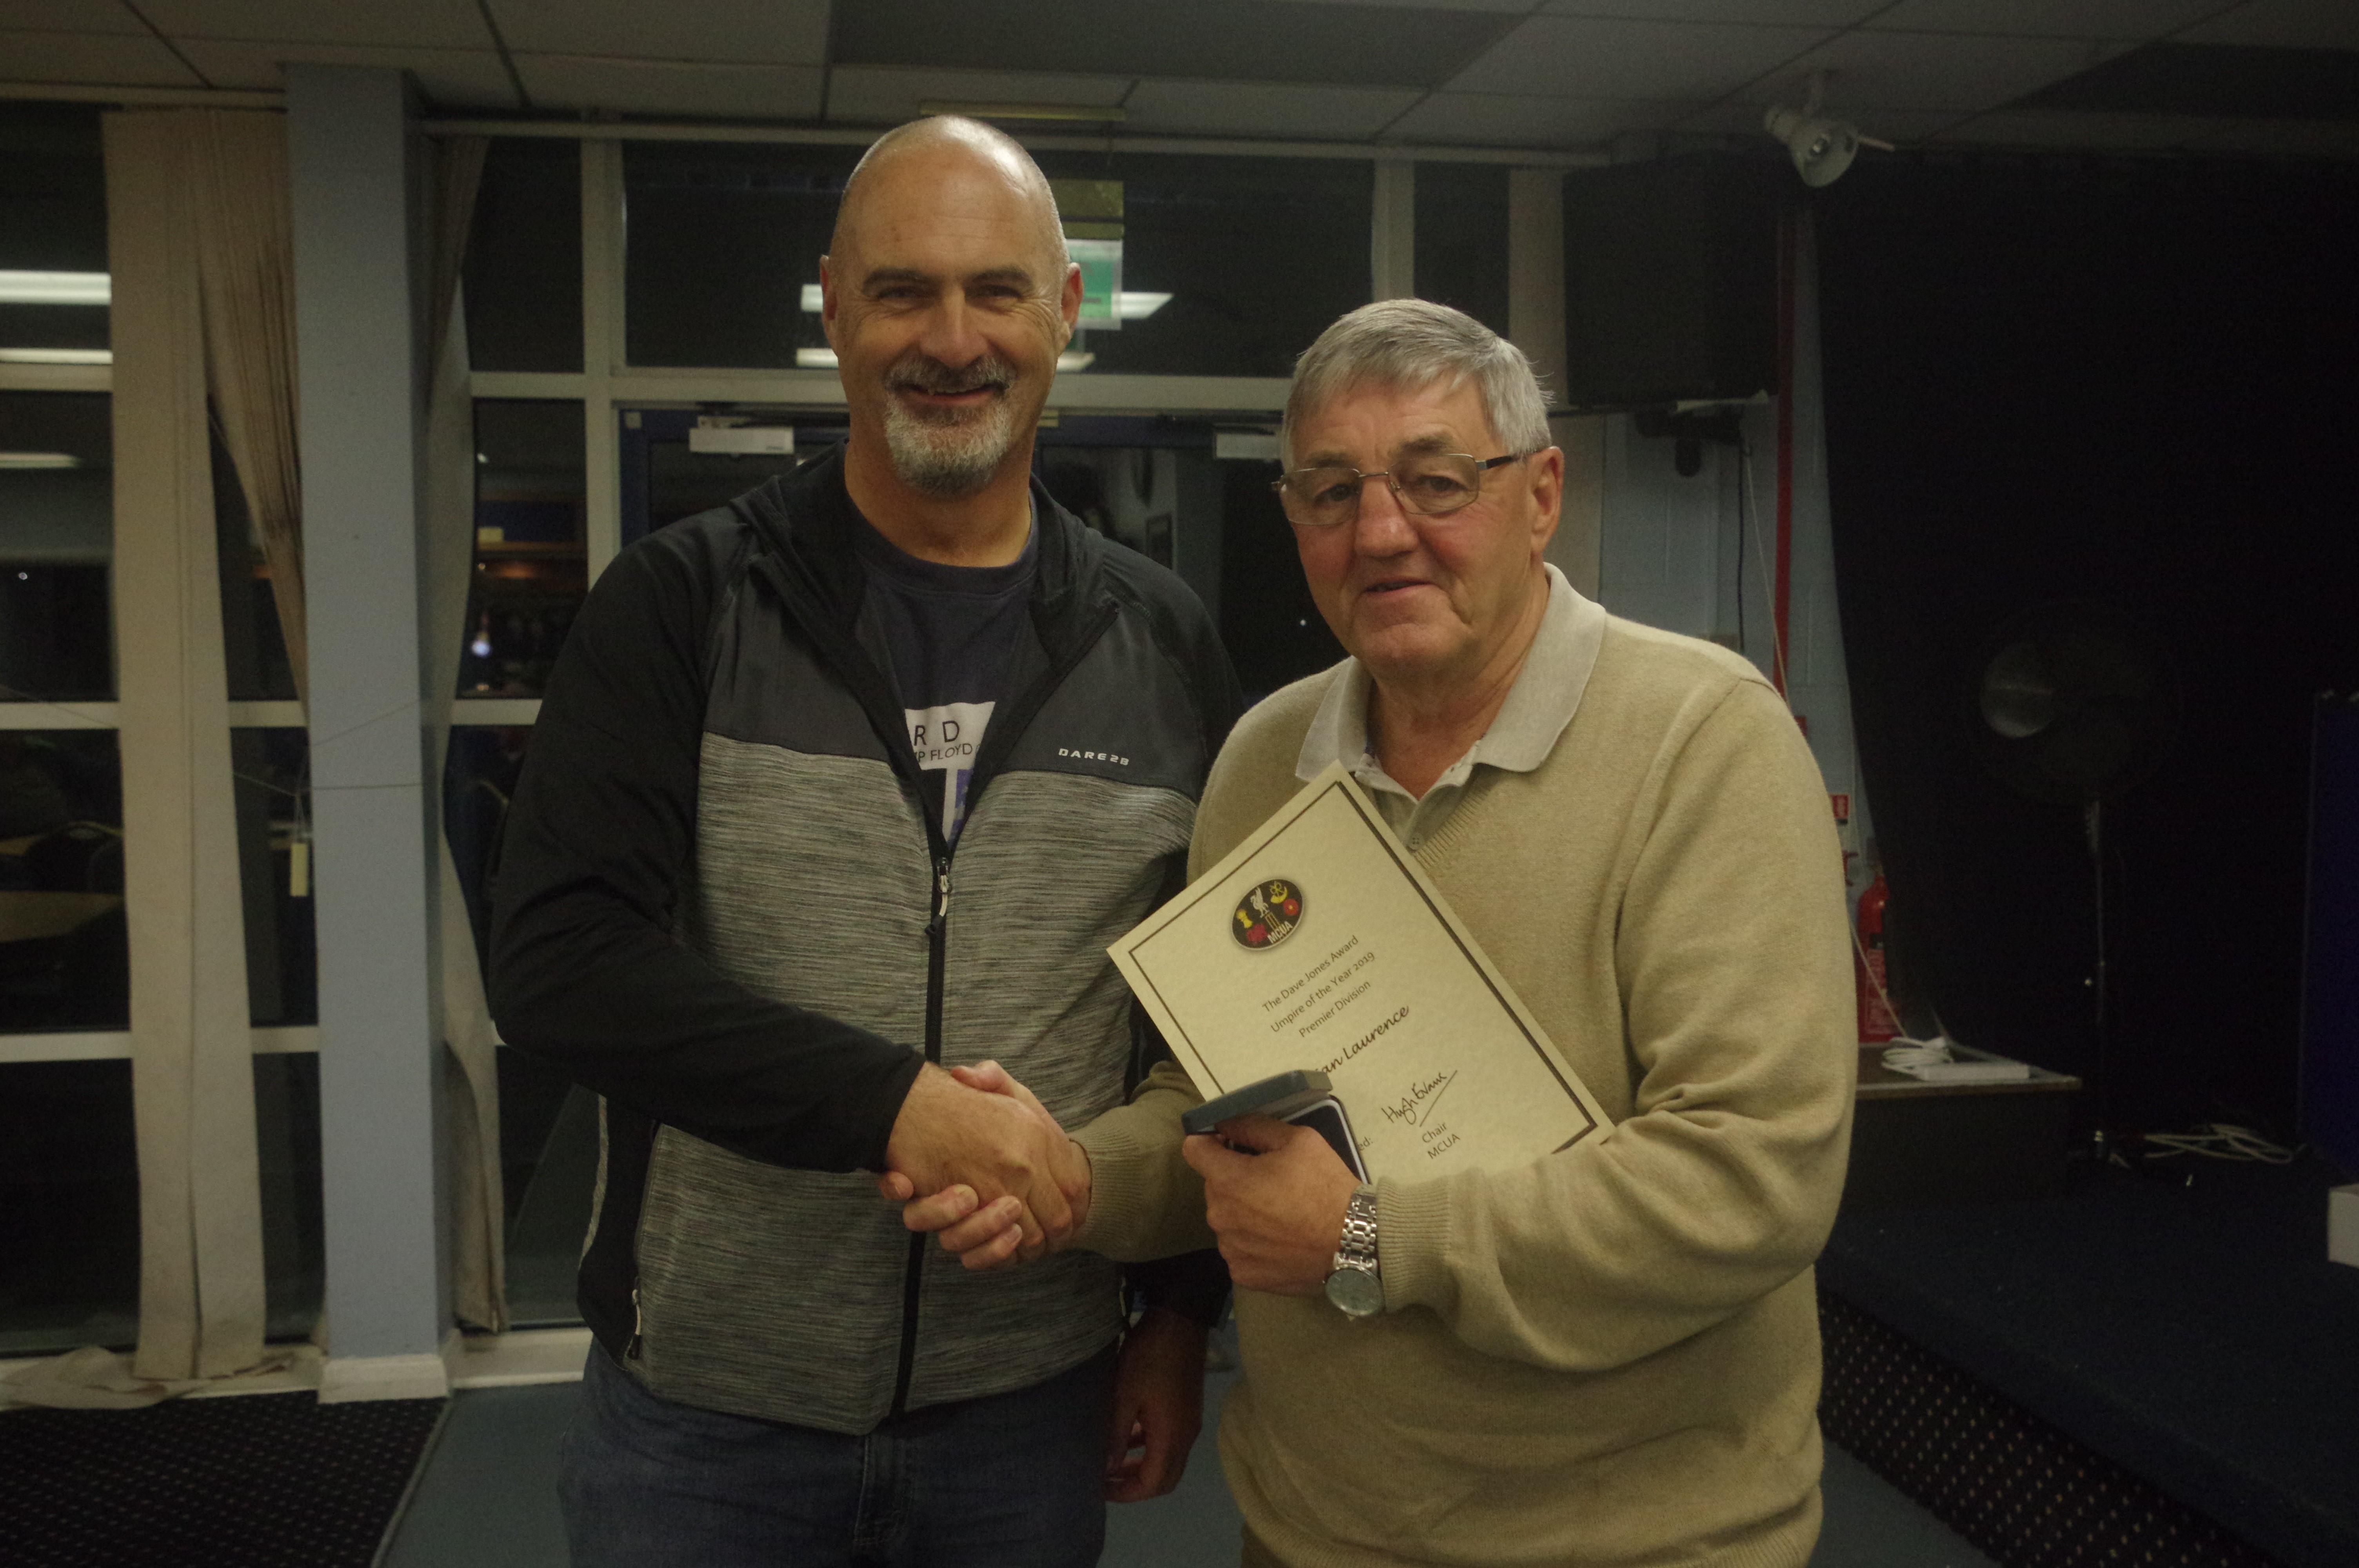 Premier Division - Ian Laurence